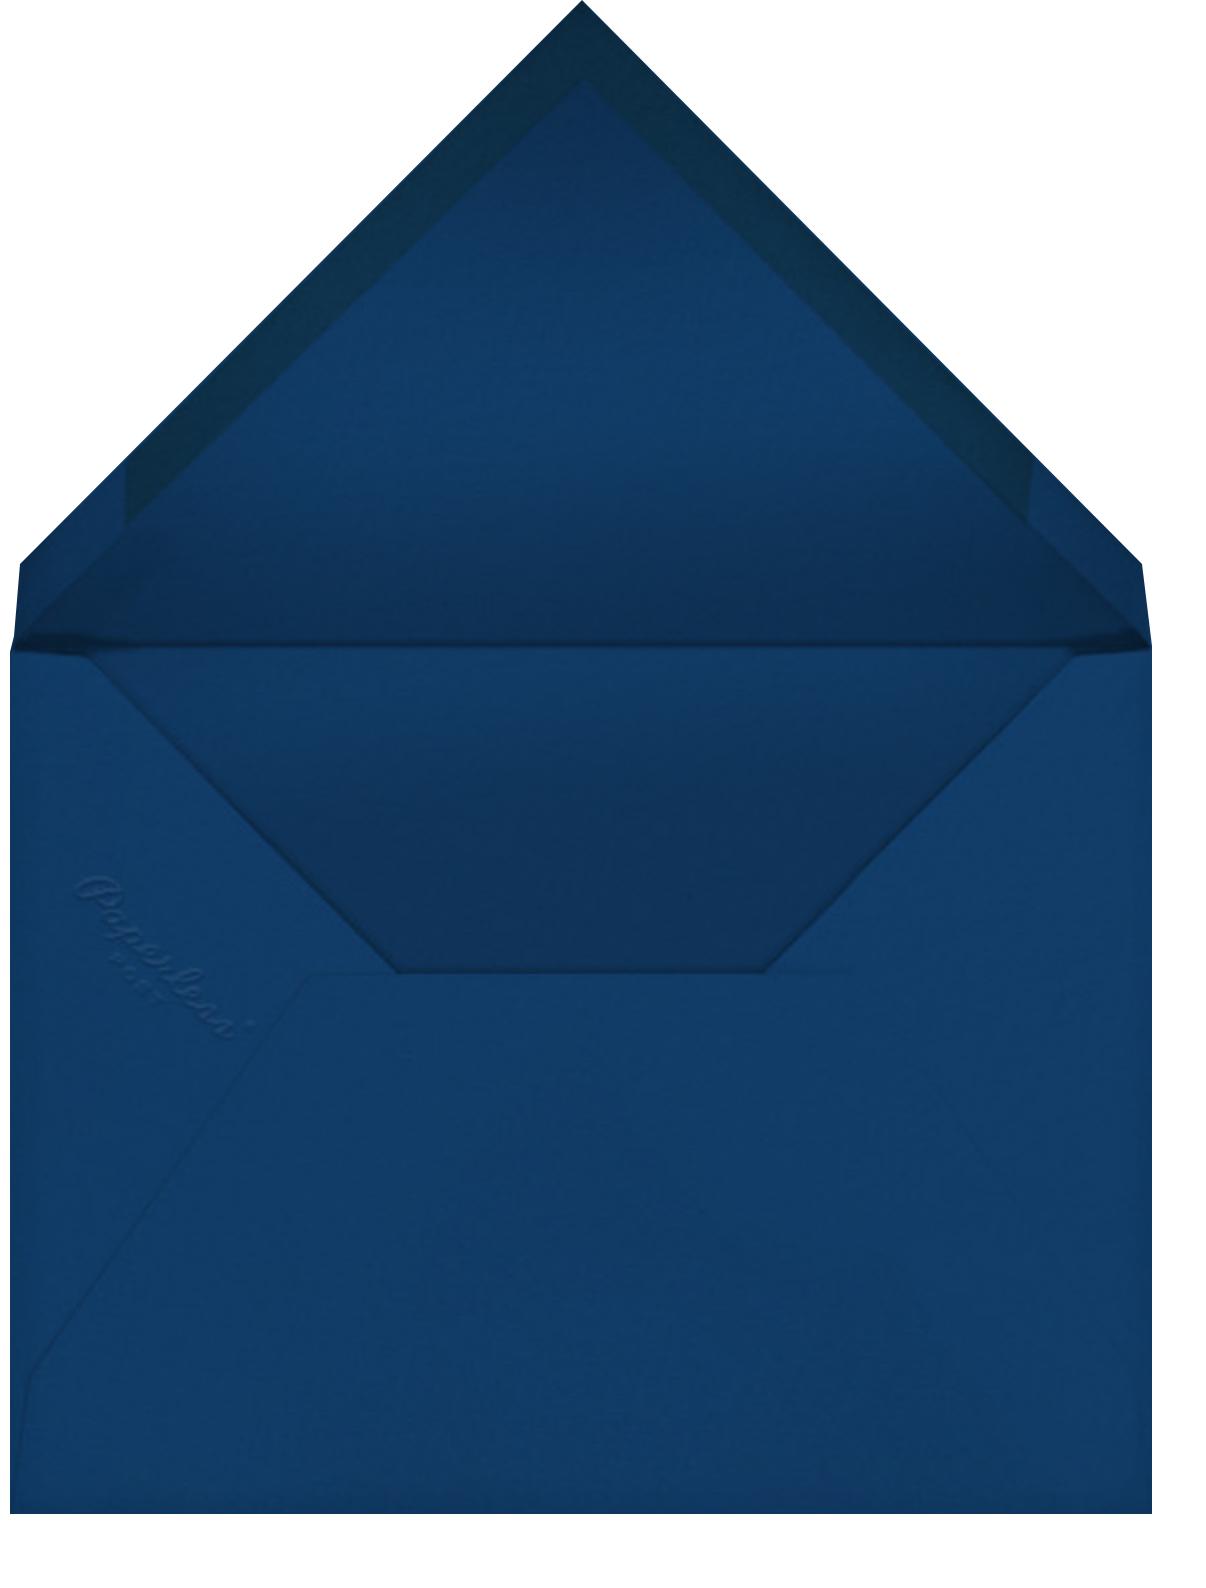 Hanukkah Dots Invitation - Paperless Post - Hanukkah - envelope back